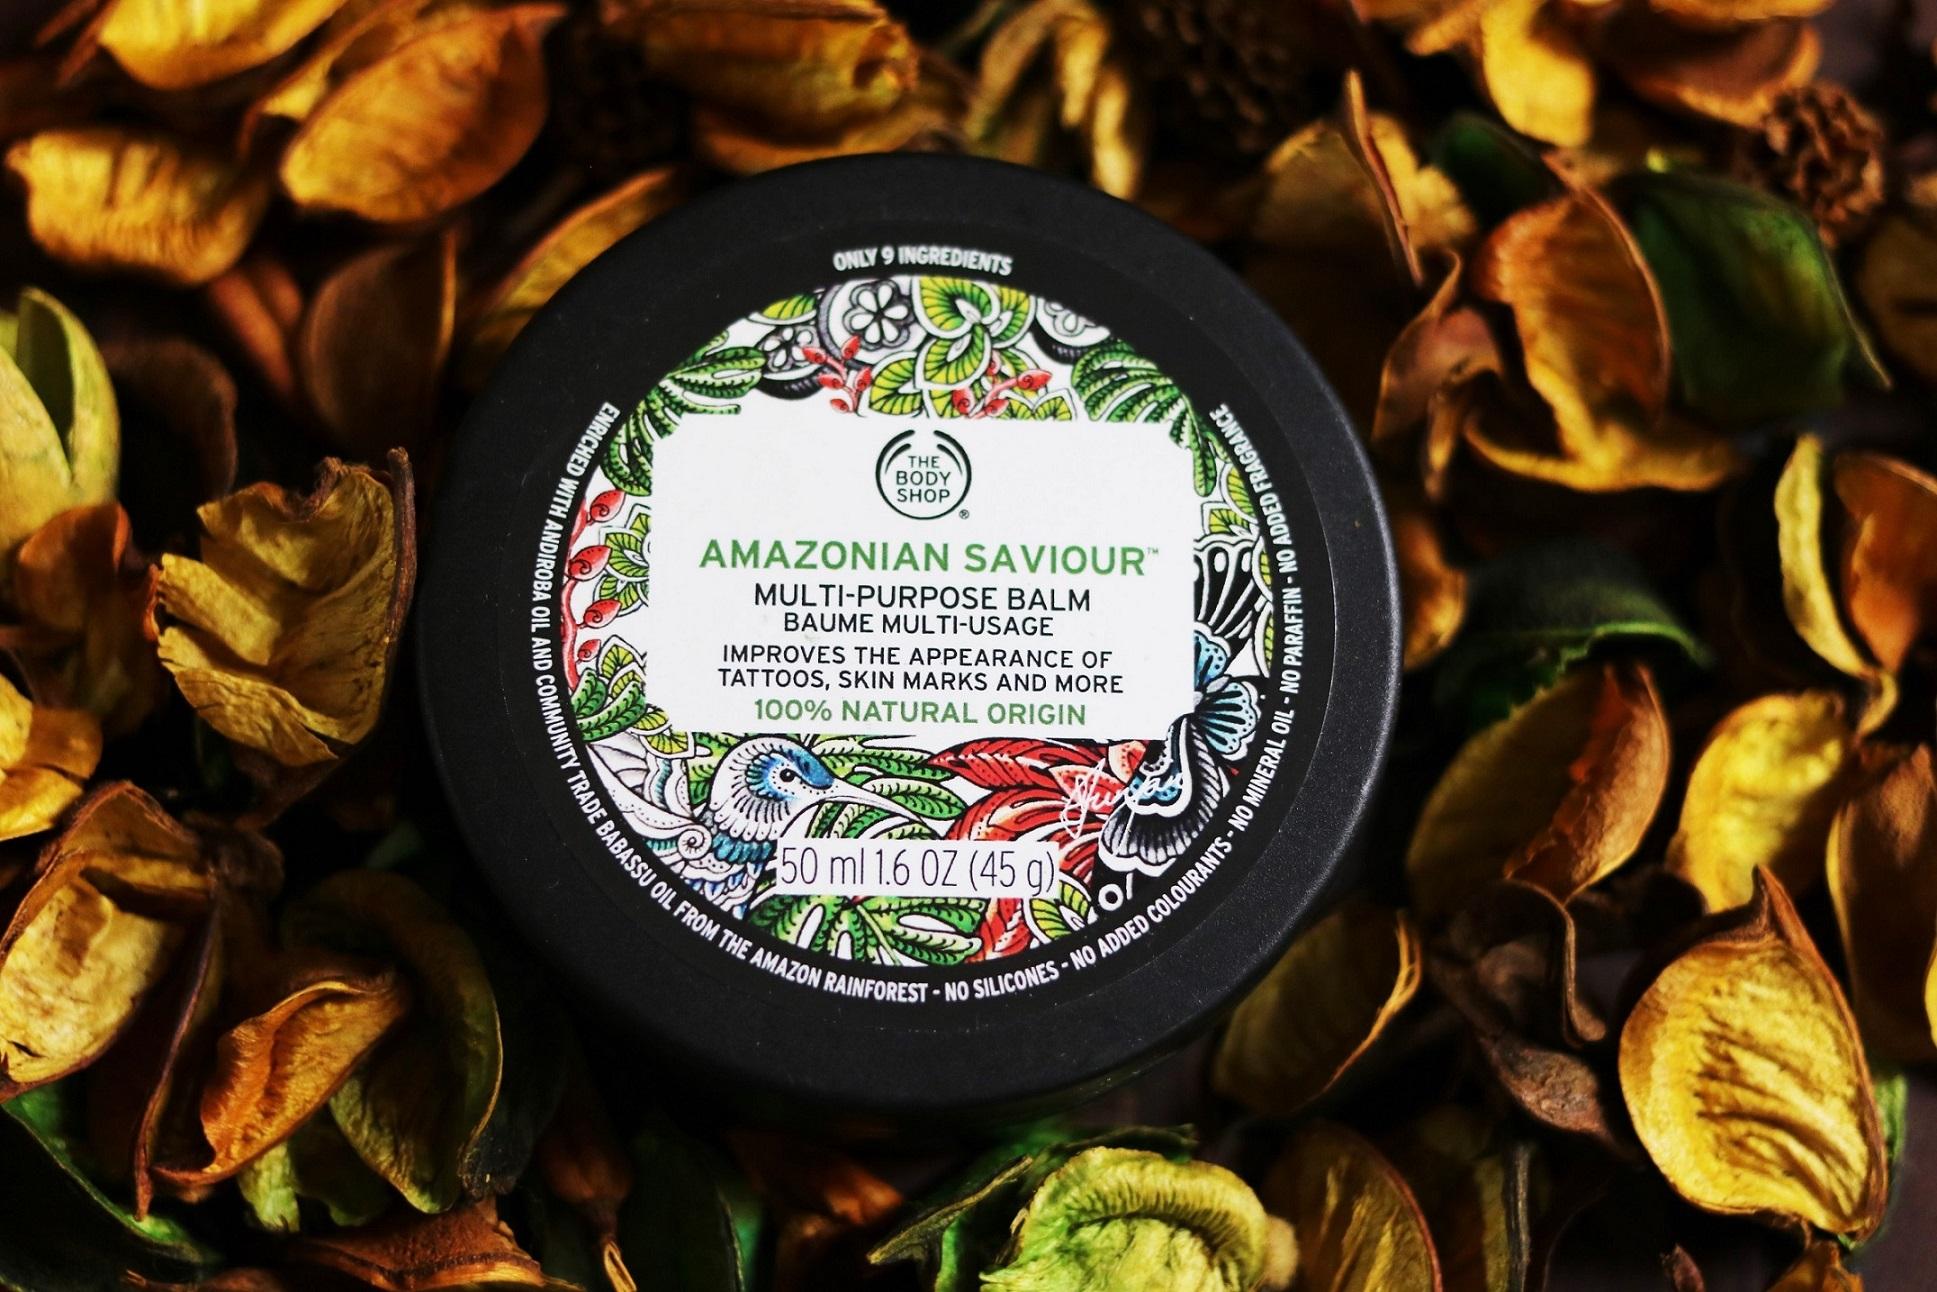 The Body Shop Amazonian Saviour Multi-Purpose Balm